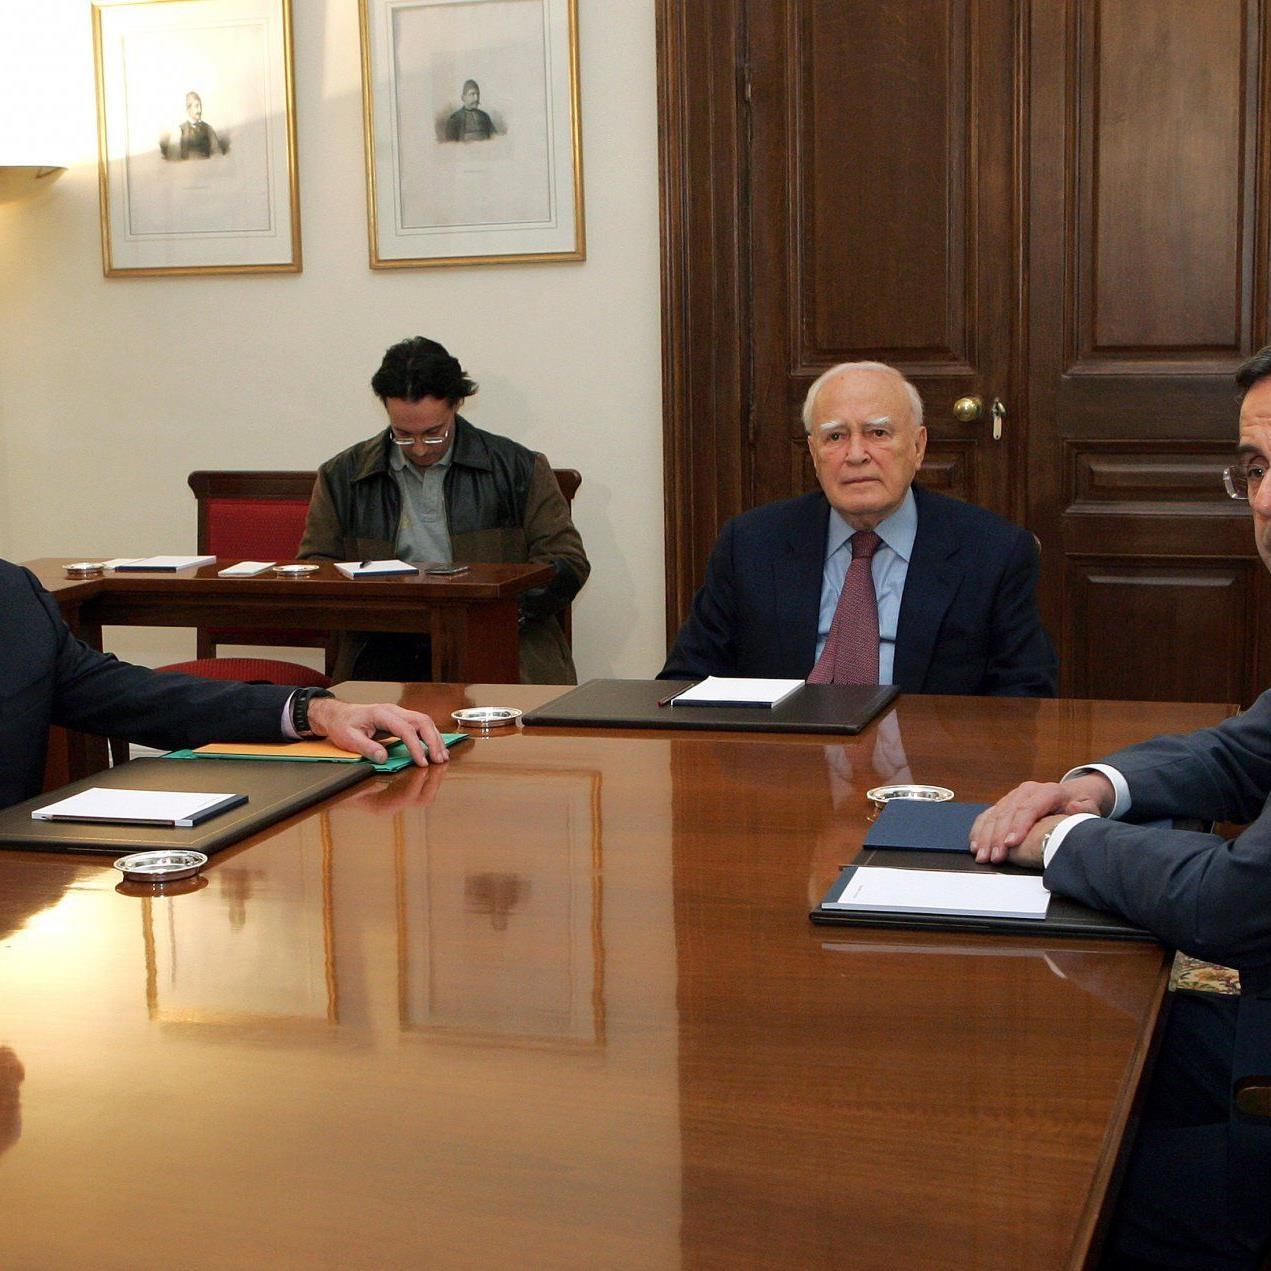 v.l.n.r.: Ministerpräsident Giorgos Papandreou, Staatspräsident Karolos Papoulias und Oppositionsführer Antonis Samaras.